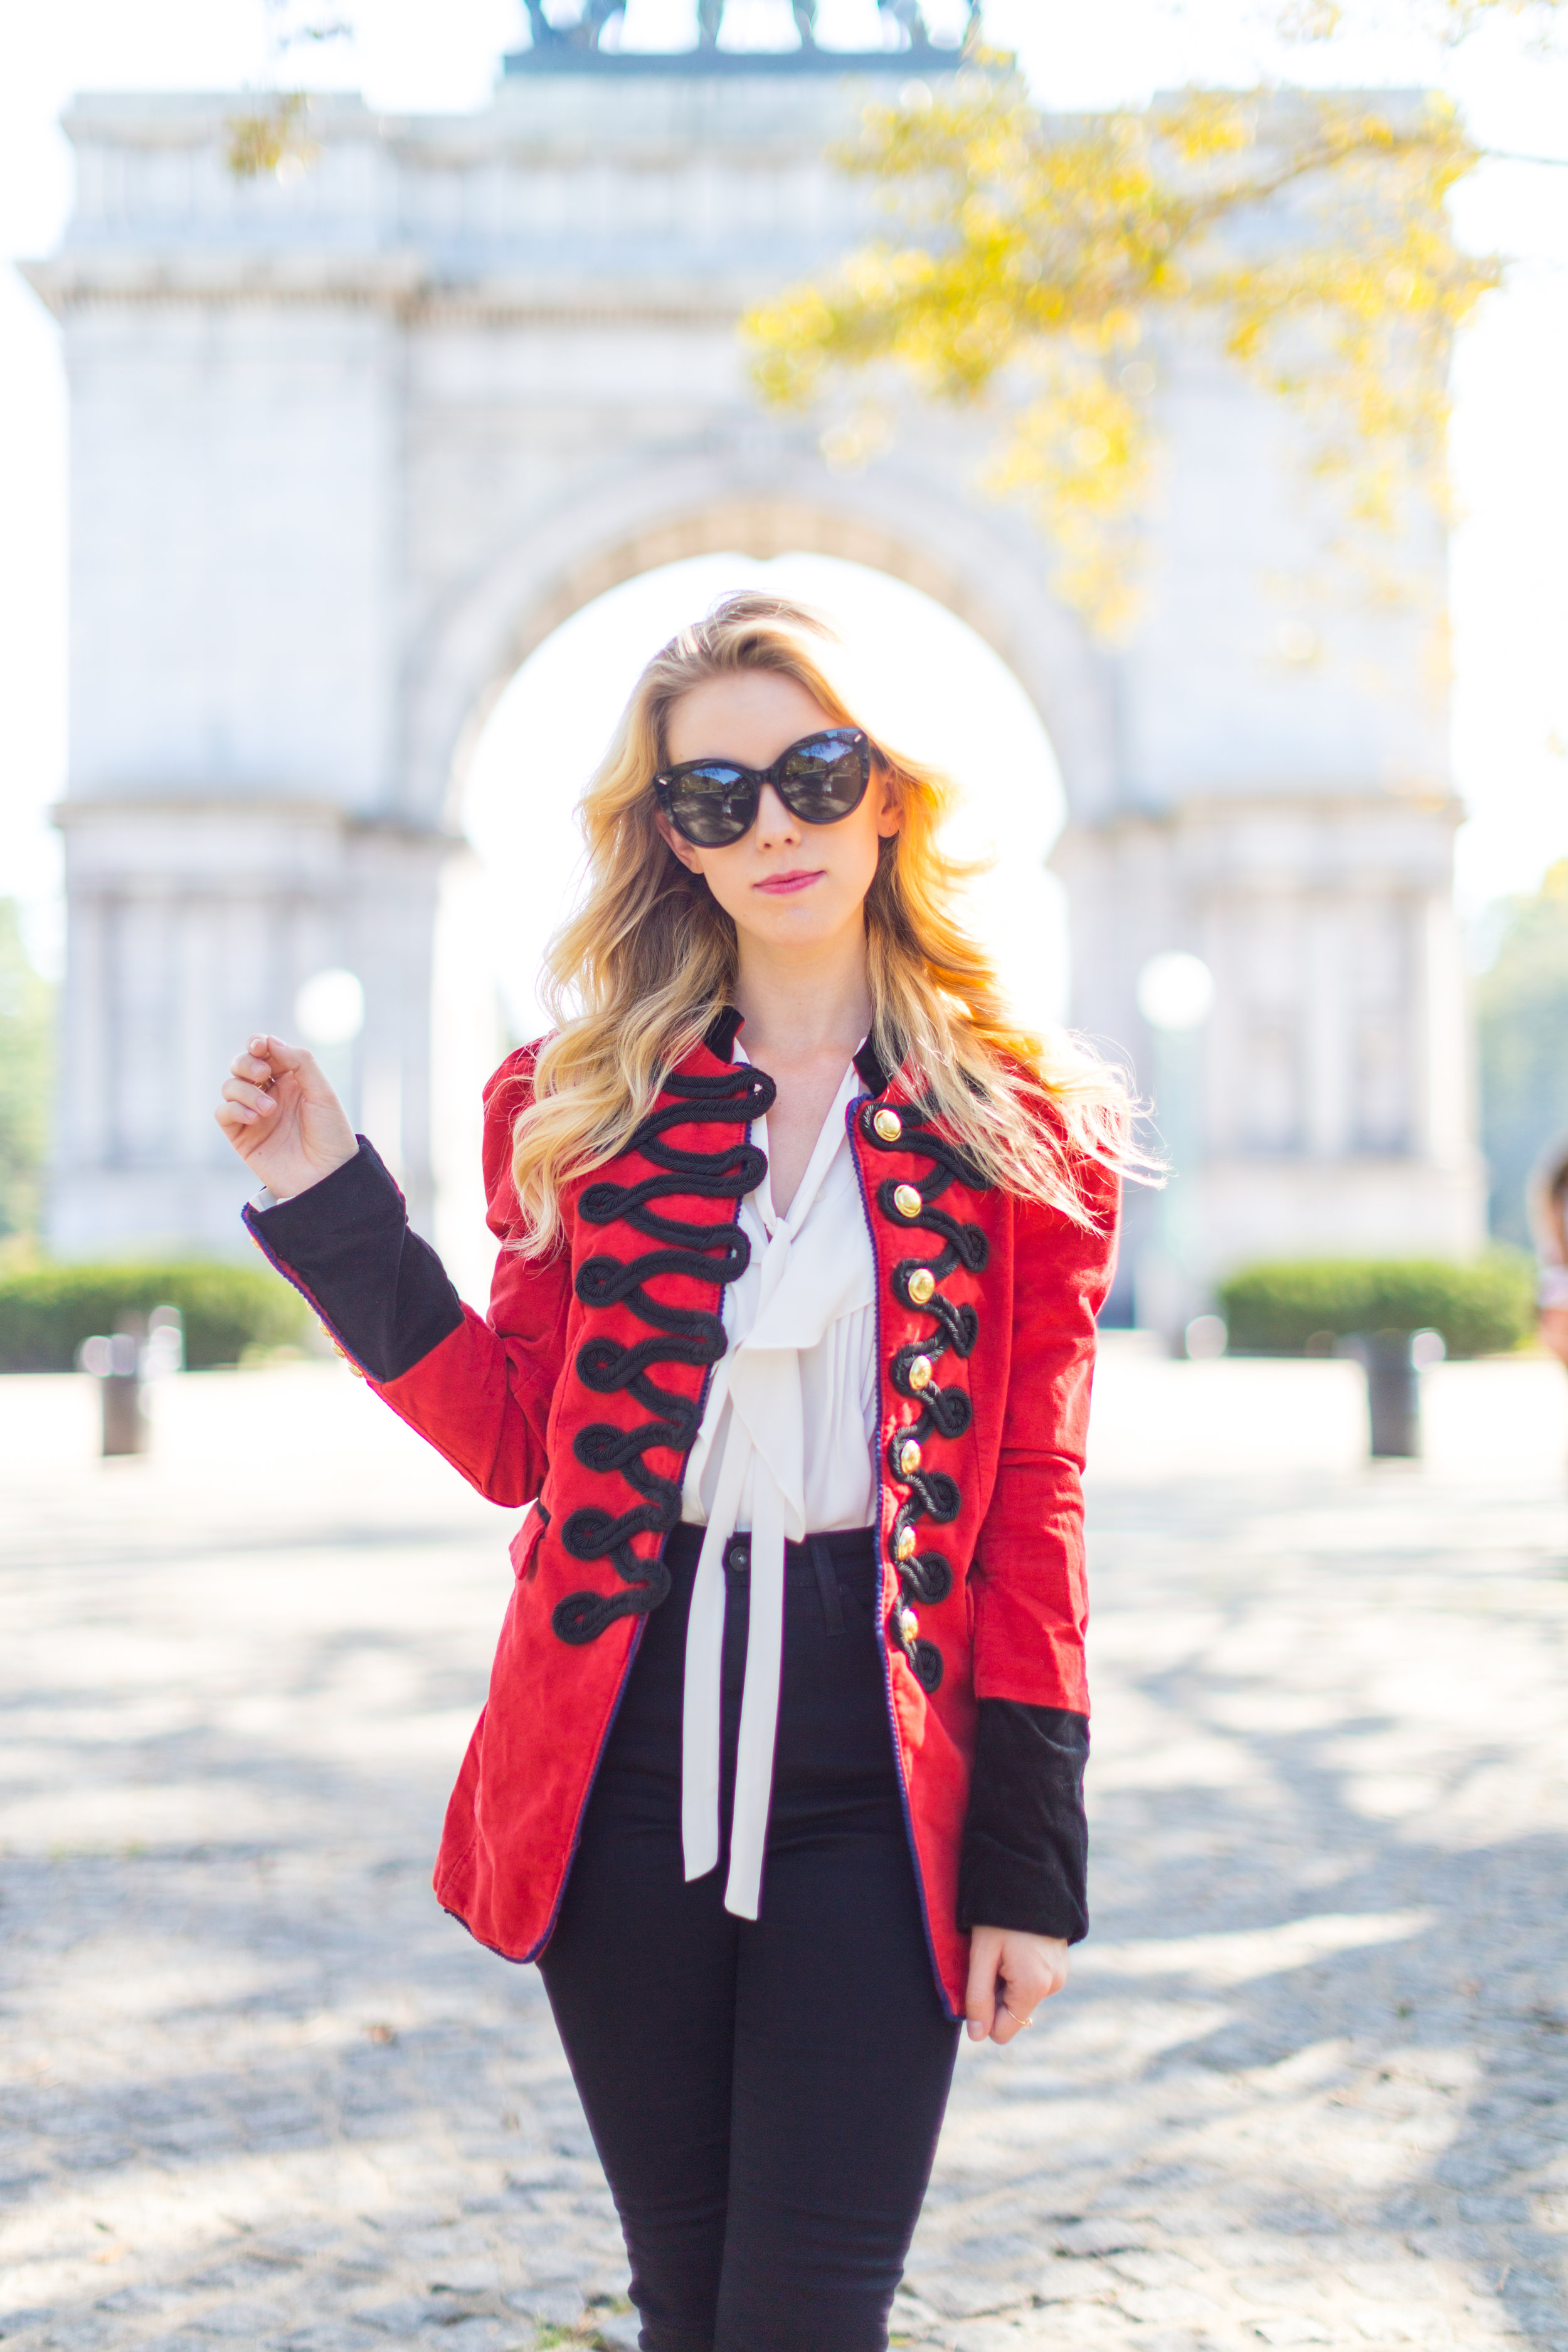 Fall Fashion Red Band Jacket Trendy-3.jpg